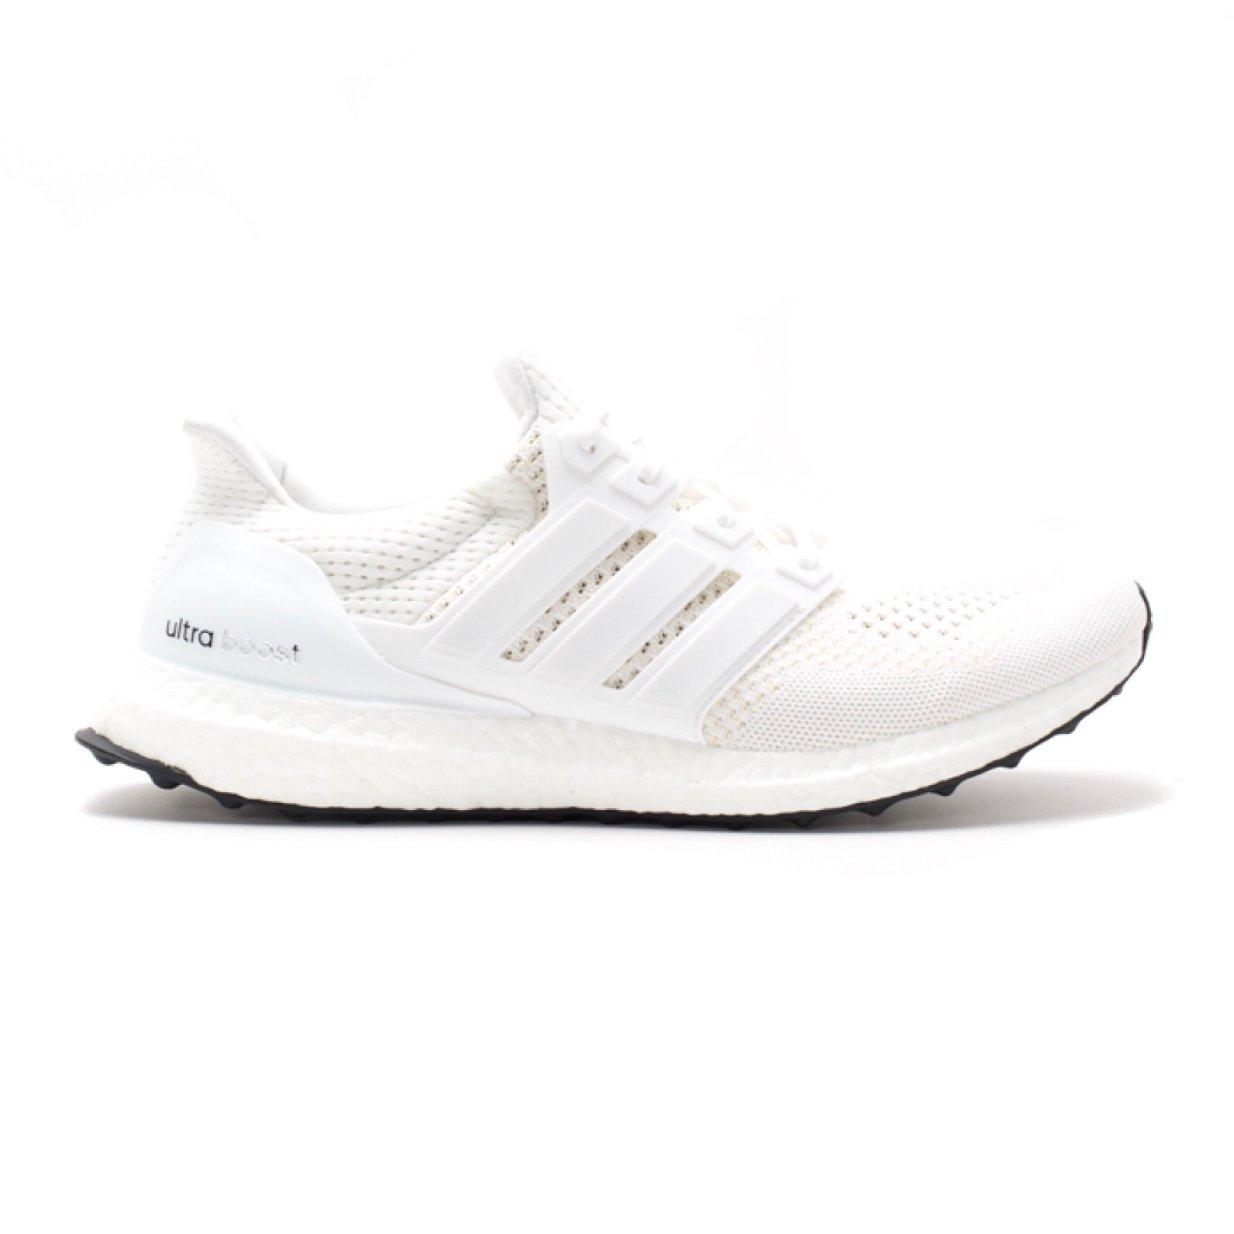 Adidas Ultra Boost Triple White 1.0